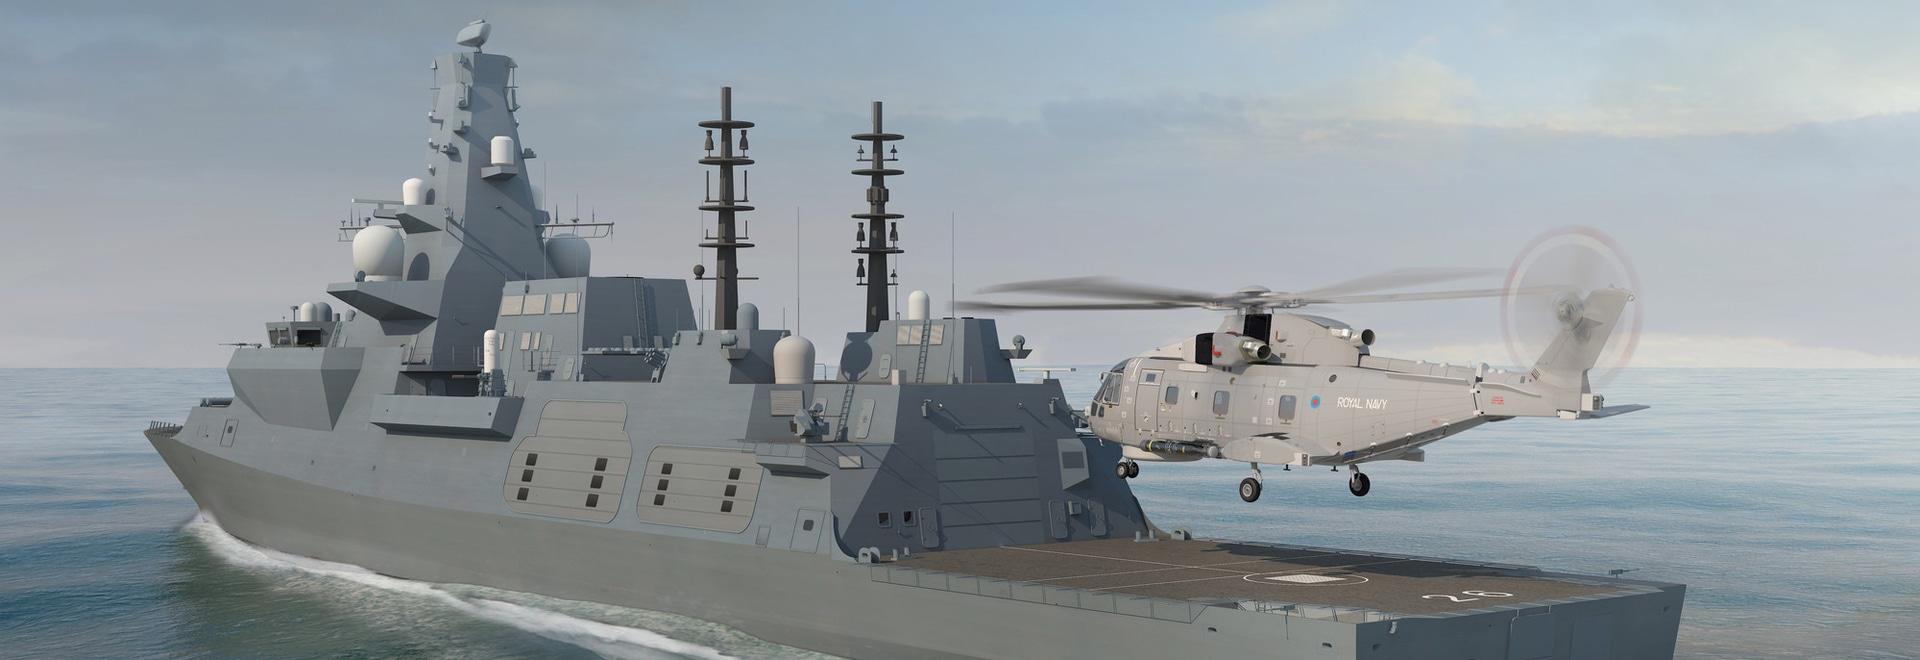 DESMI Whole Ship Pump Integrator on Board UK Royal Navy's New Type 26 Frigates